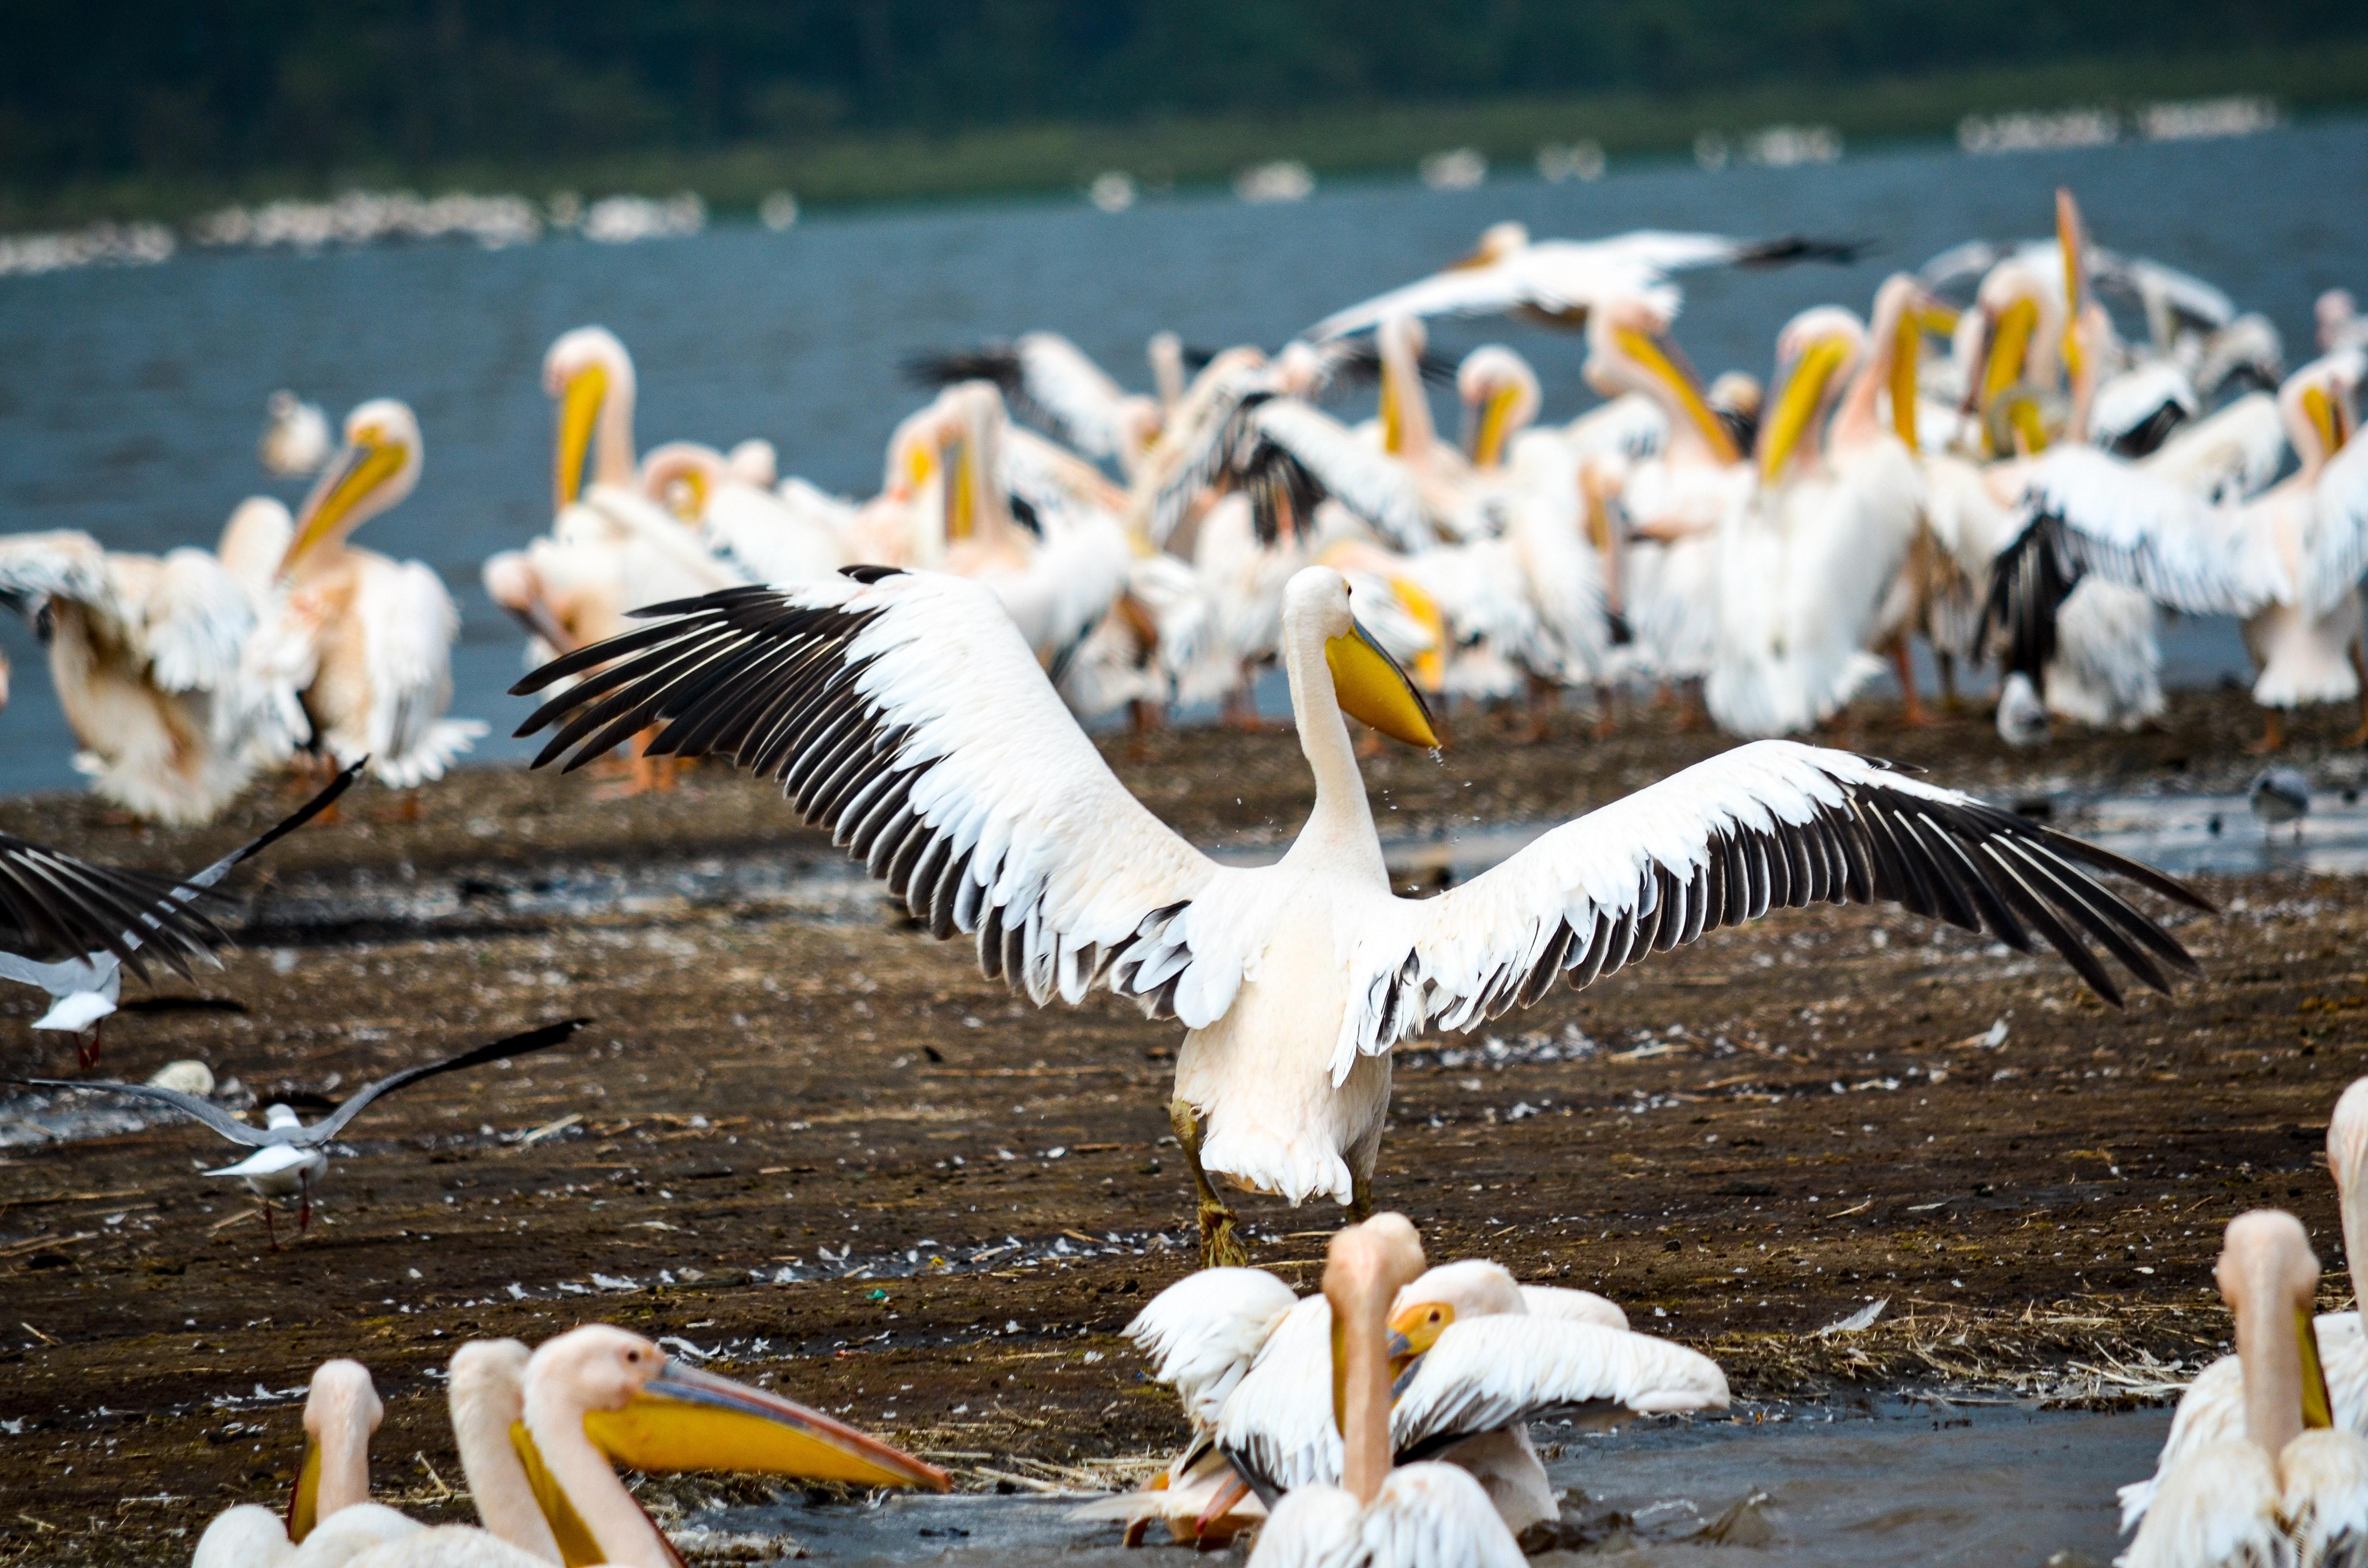 Flock of Pelicans in Seashore, Animal, Outdoors, Waterfowl, Water bird, HQ Photo